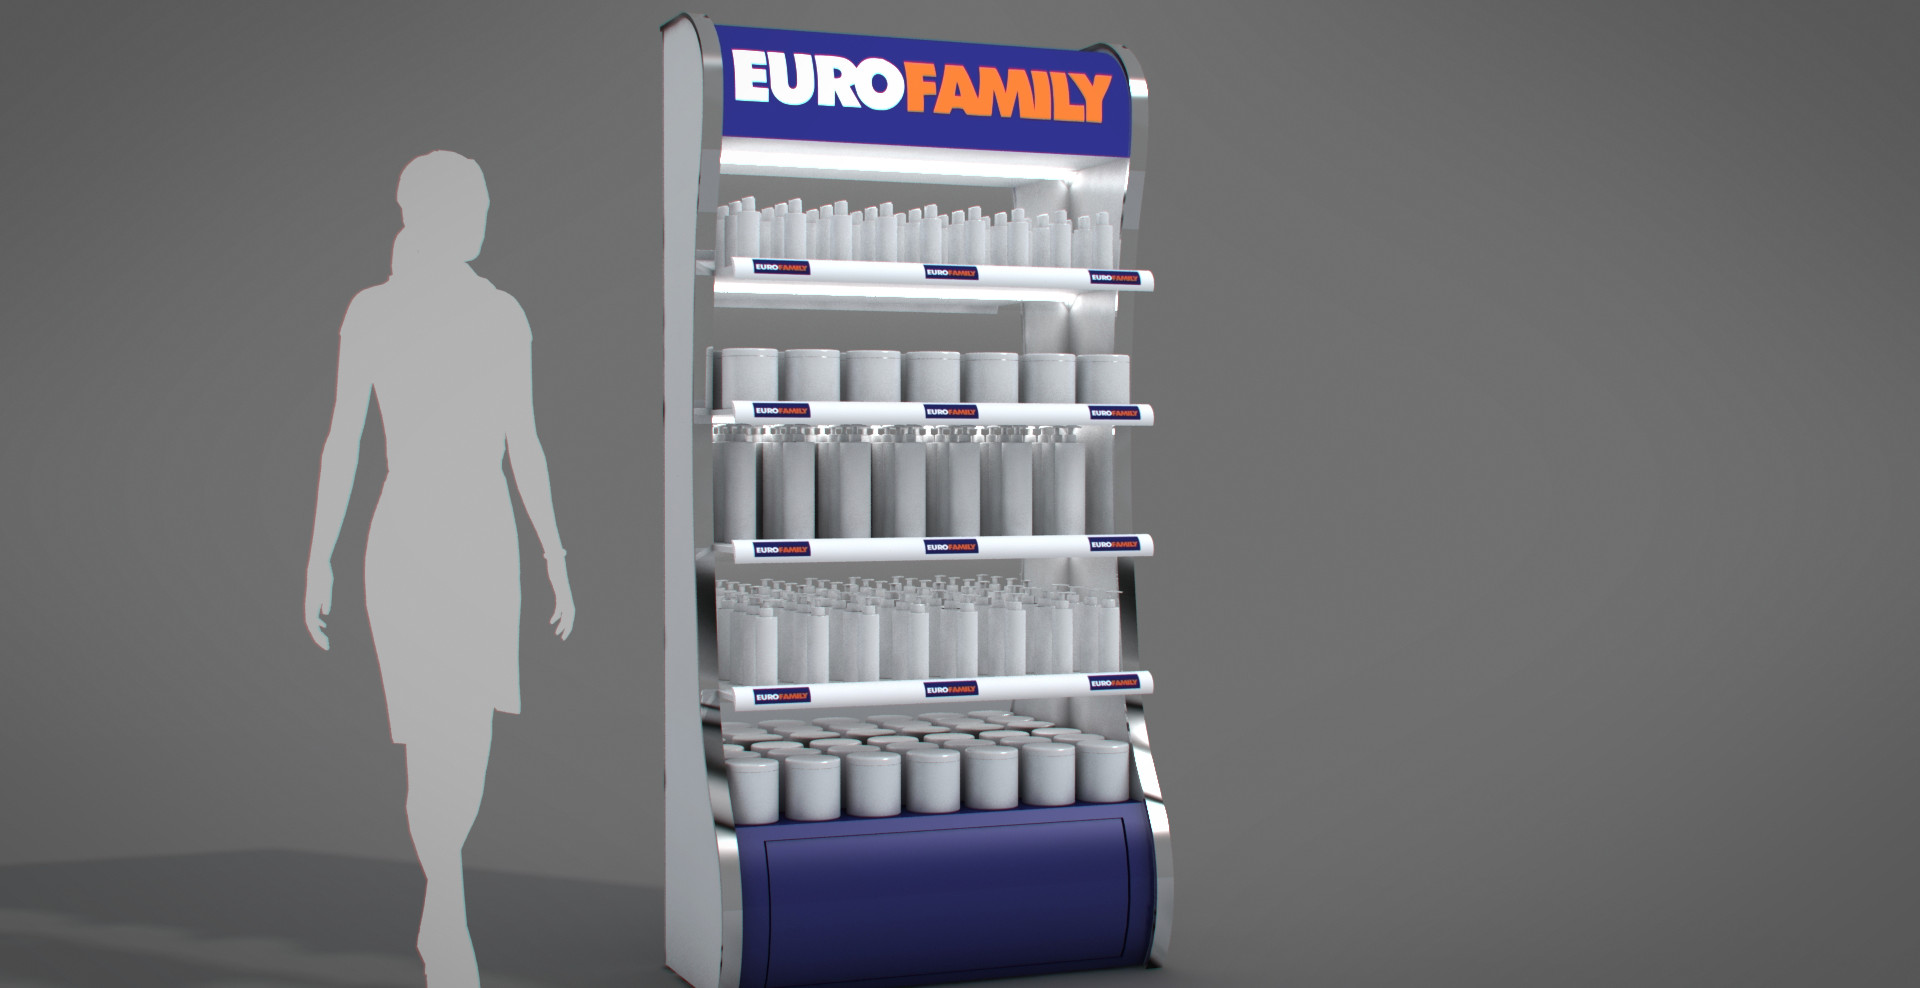 Eurofamily - kozmetikai display tervezés